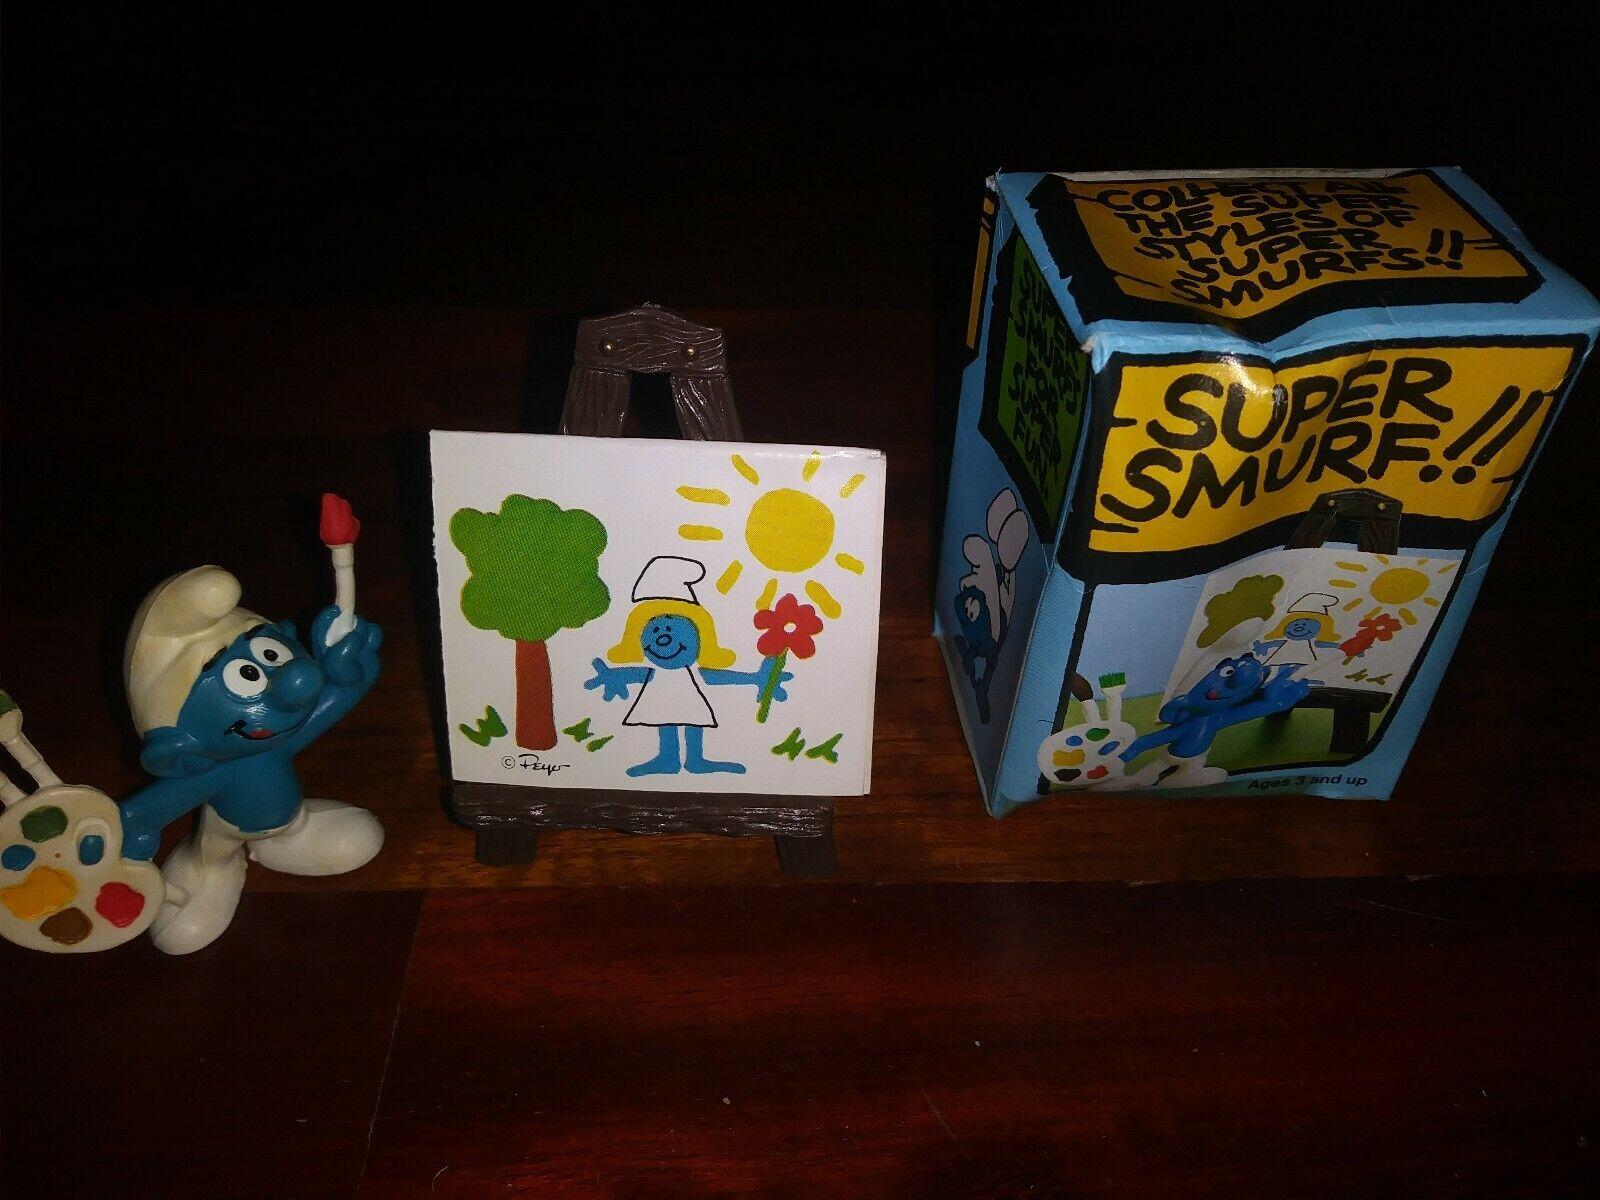 Smurfs Artist Super Smurf 40239 RARE Painter Brush Vintage Figure PVC Toy BOX